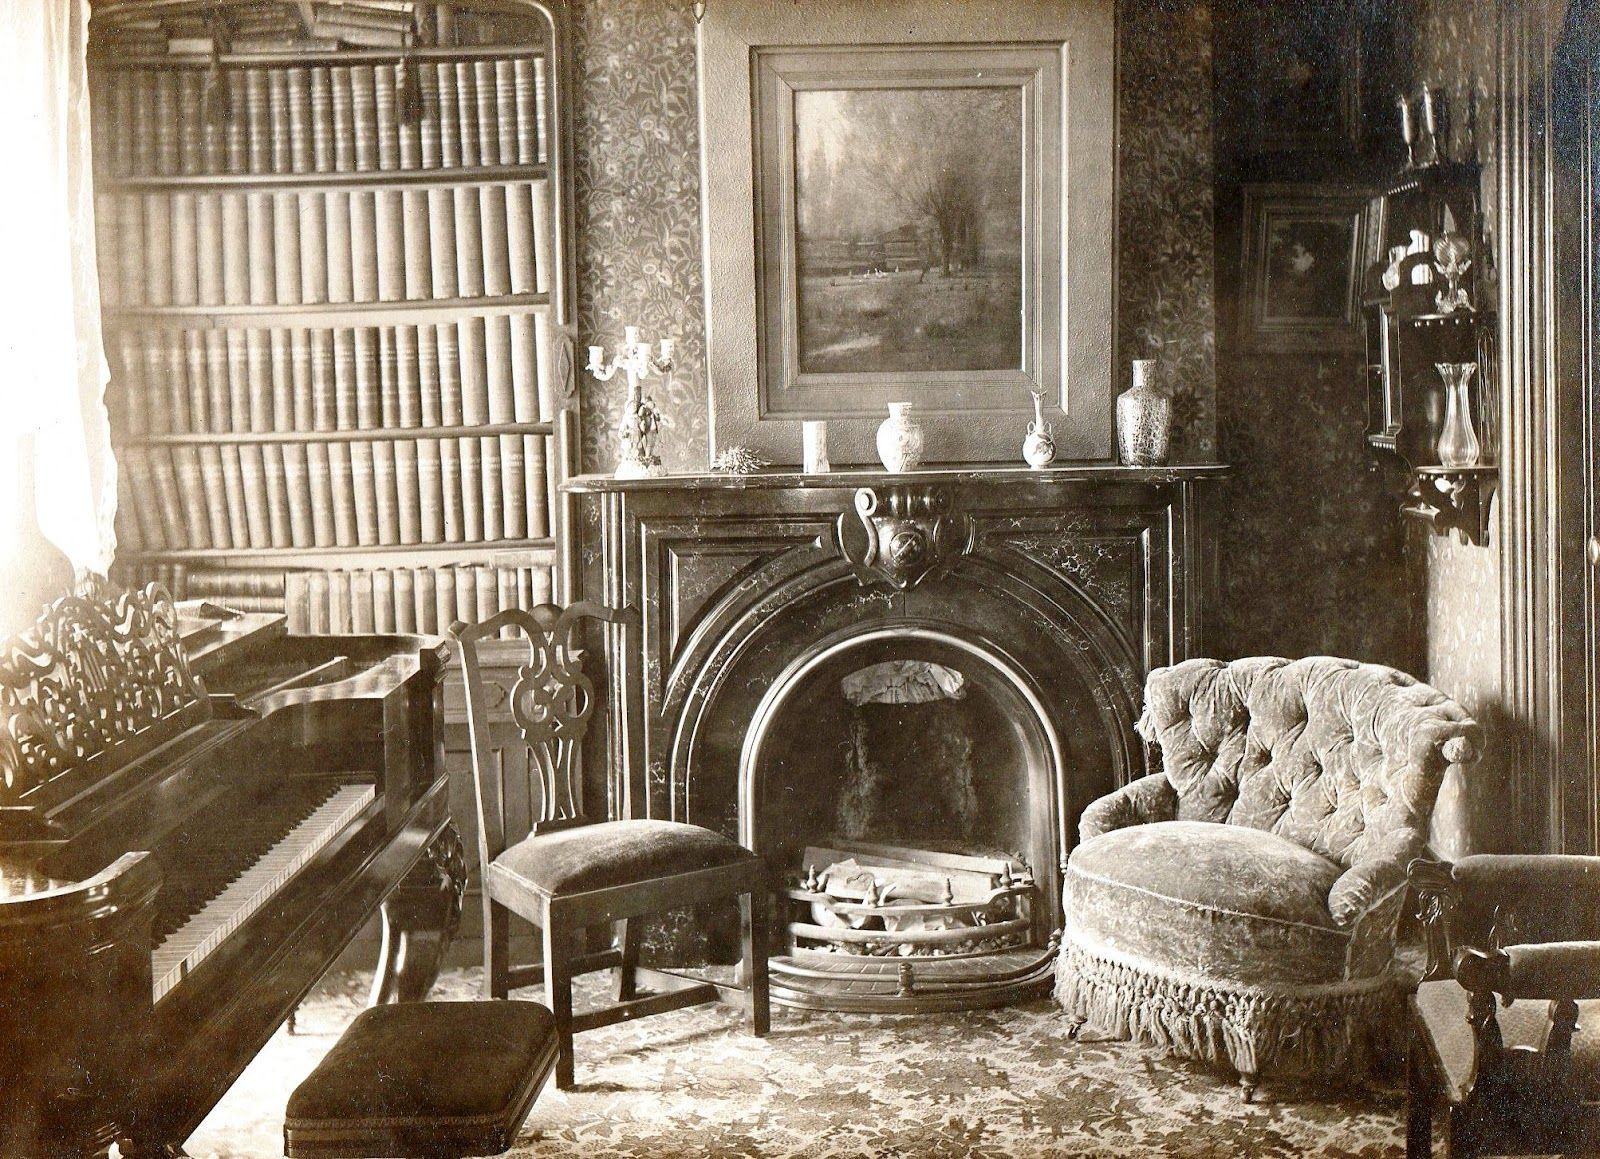 inside victorian era homes  Victorian House Interior Architecture Elegant Victorian Era Interiors   inside the victorian home  Pinterest